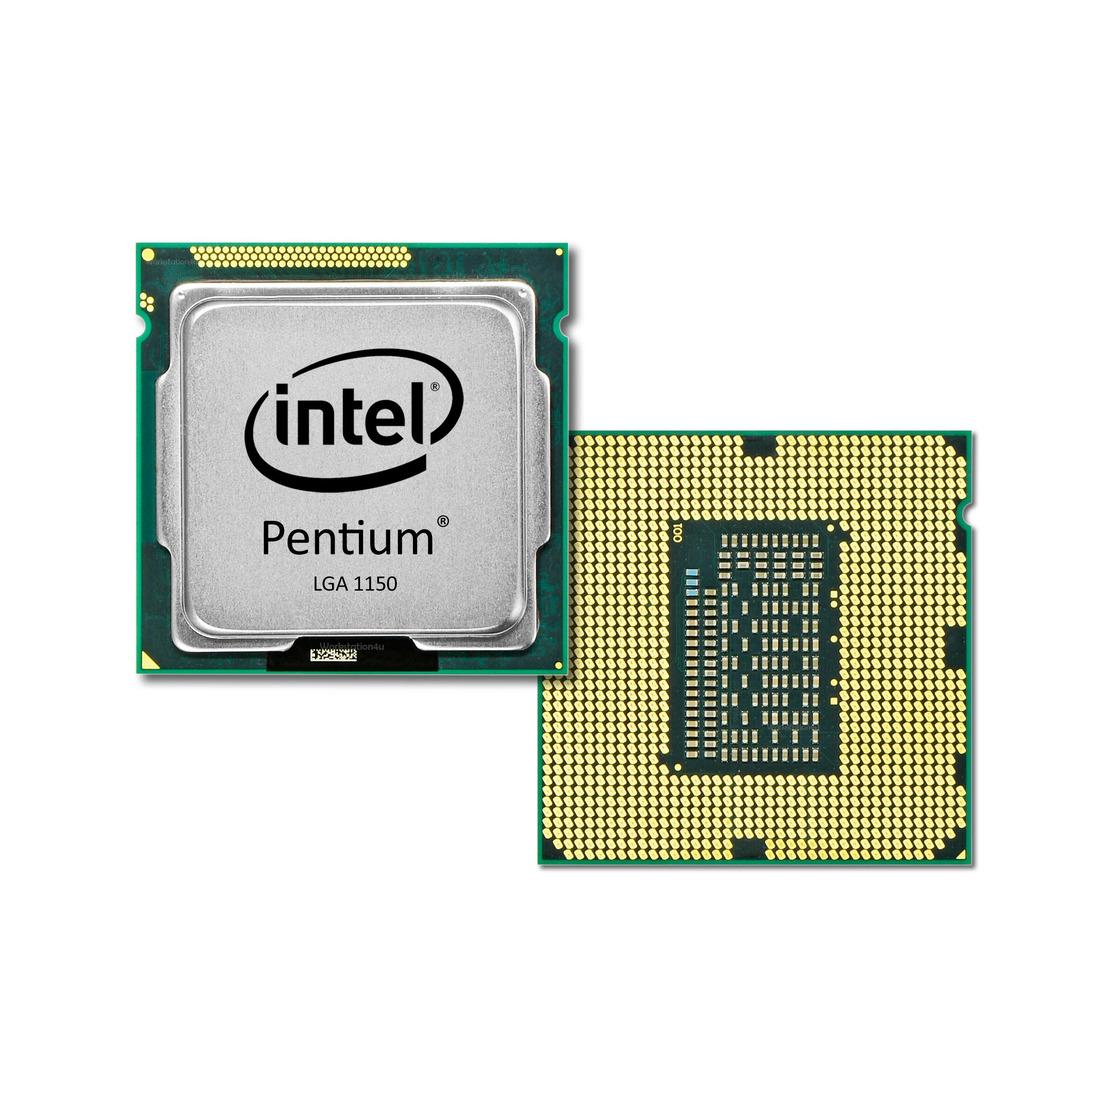 intel pentium prozessor g3250 3 mb cache 3 20 ghz. Black Bedroom Furniture Sets. Home Design Ideas